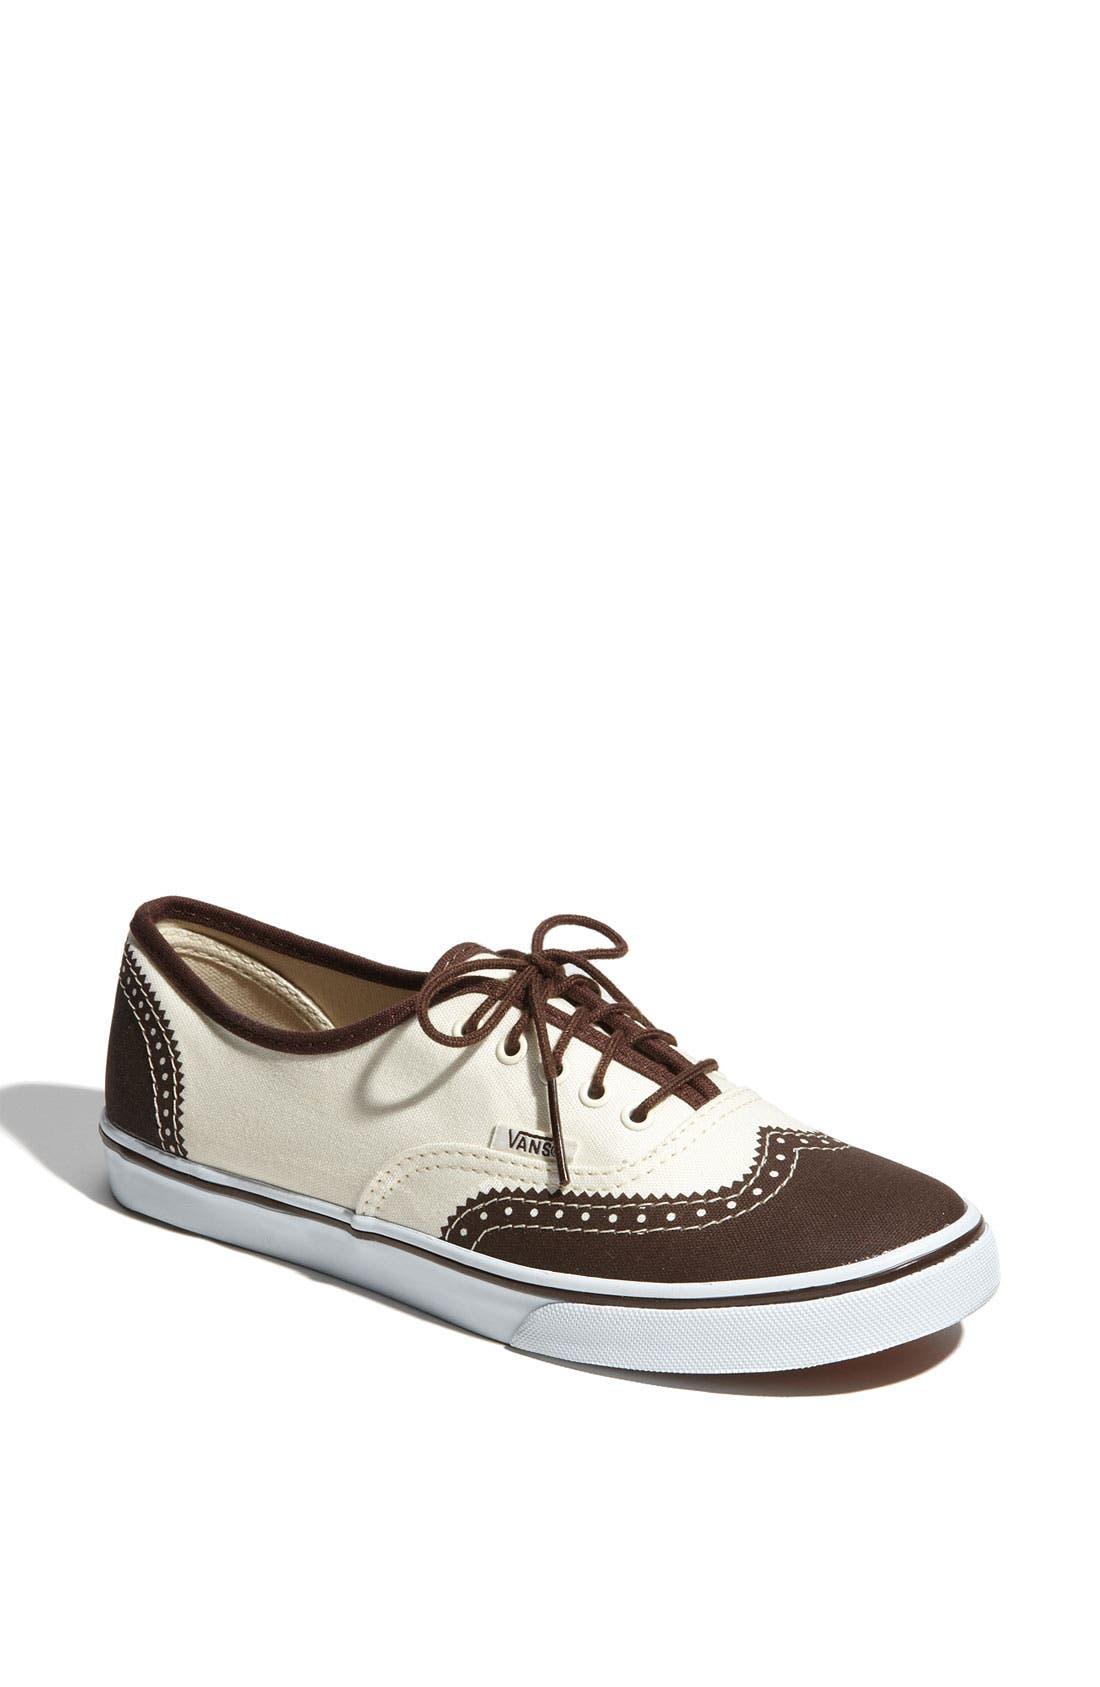 Alternate Image 1 Selected - Vans 'Oxford Lo Pro' Sneaker